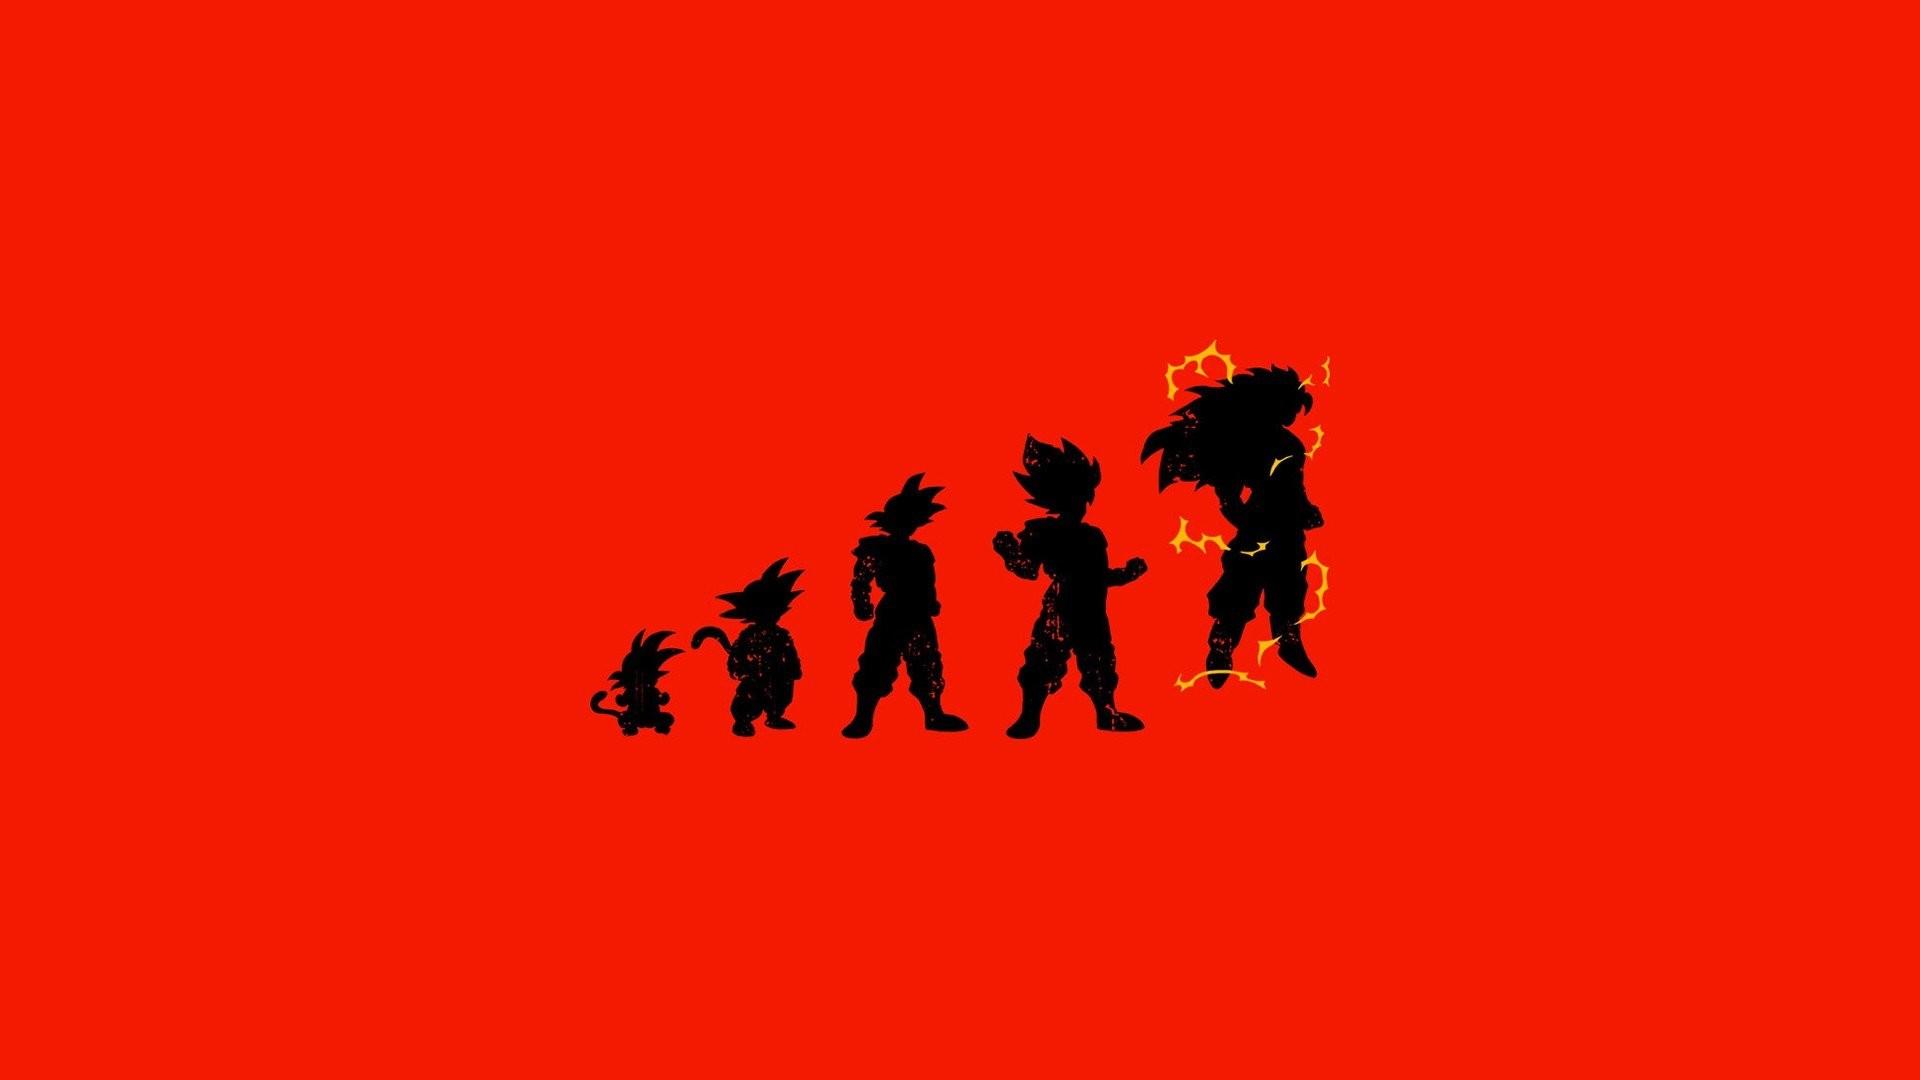 Artwork Minimalistic Red Background Simple Songoku Son Goku Super Saiyan 4